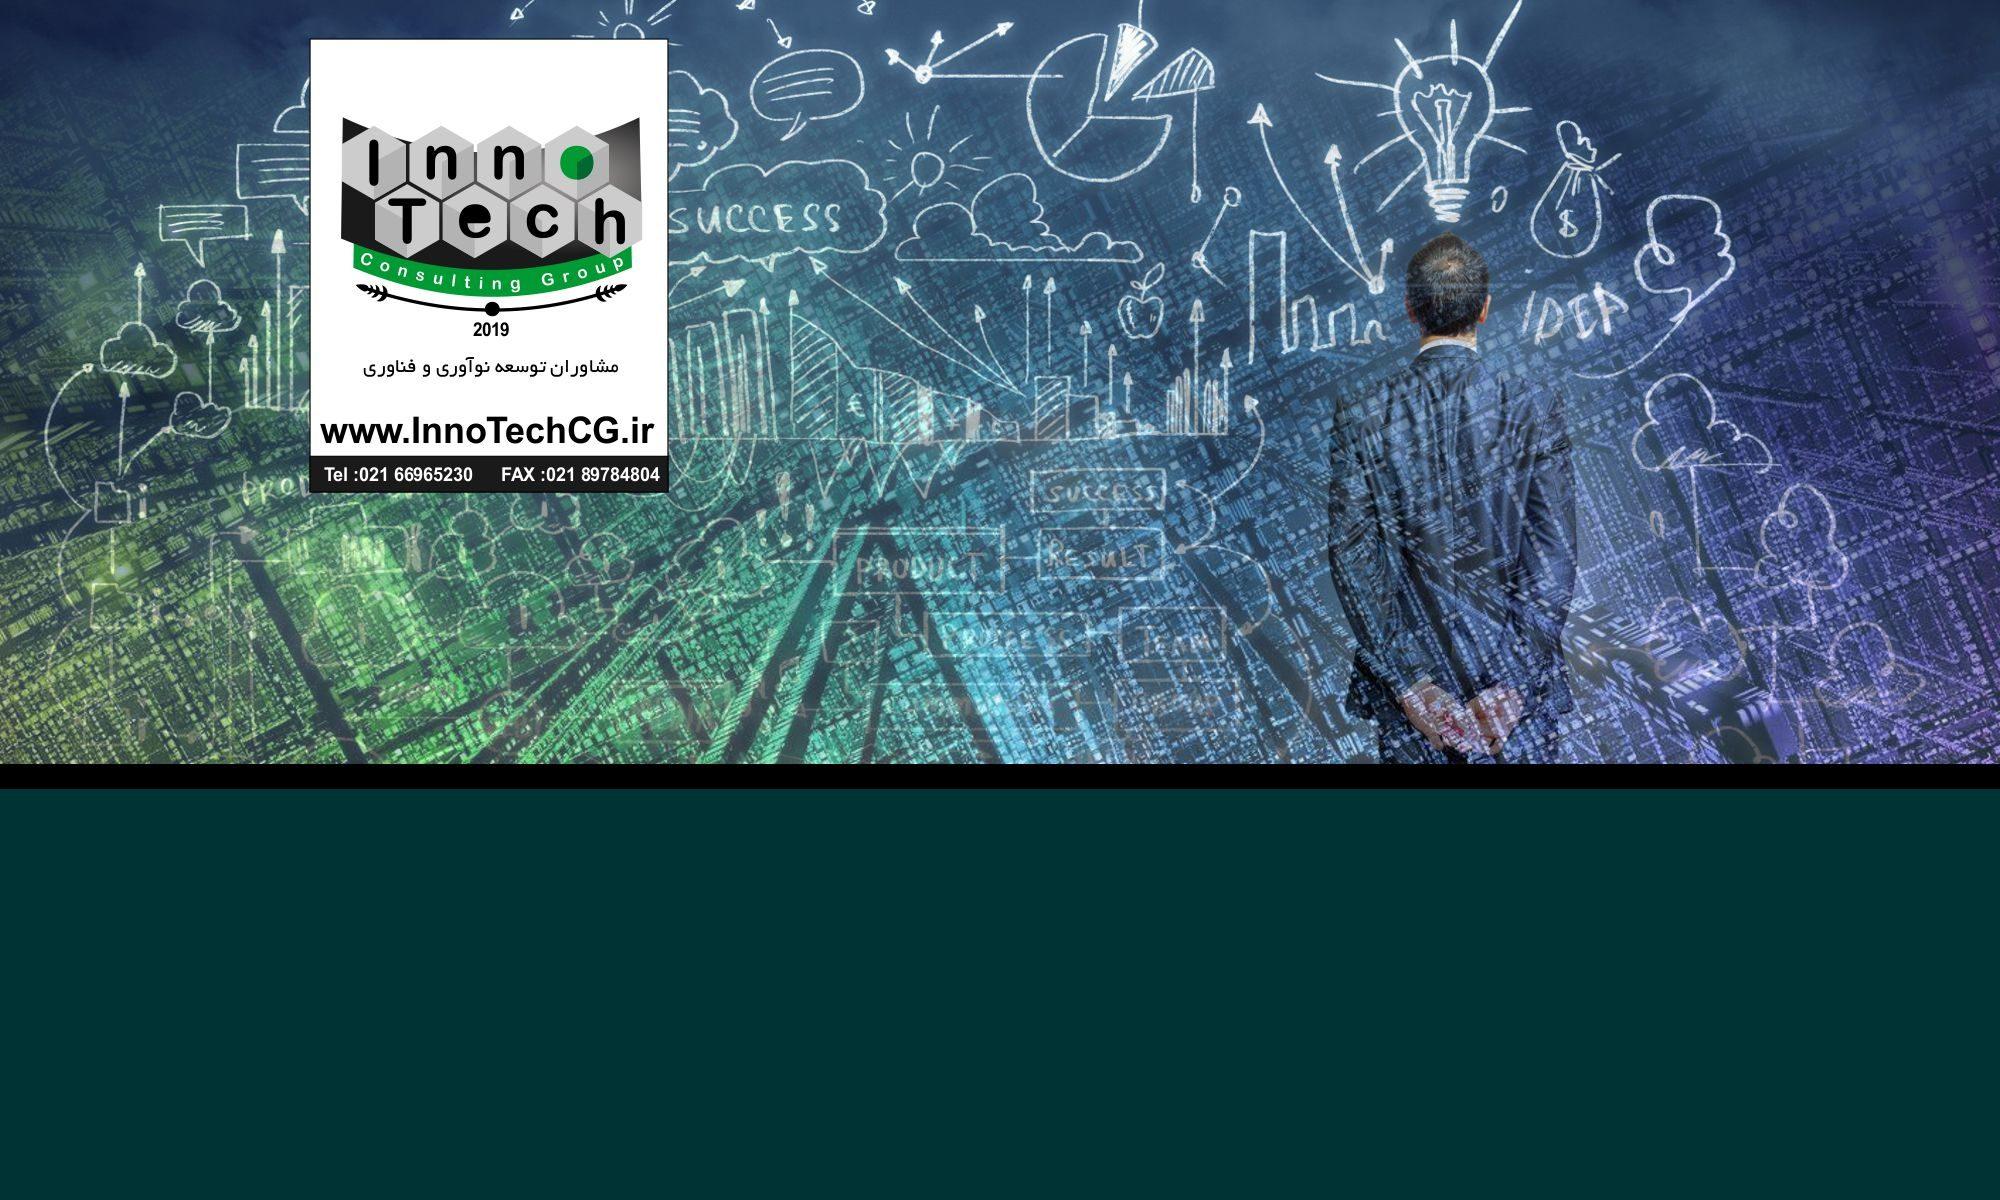 InnoTechCG.ir